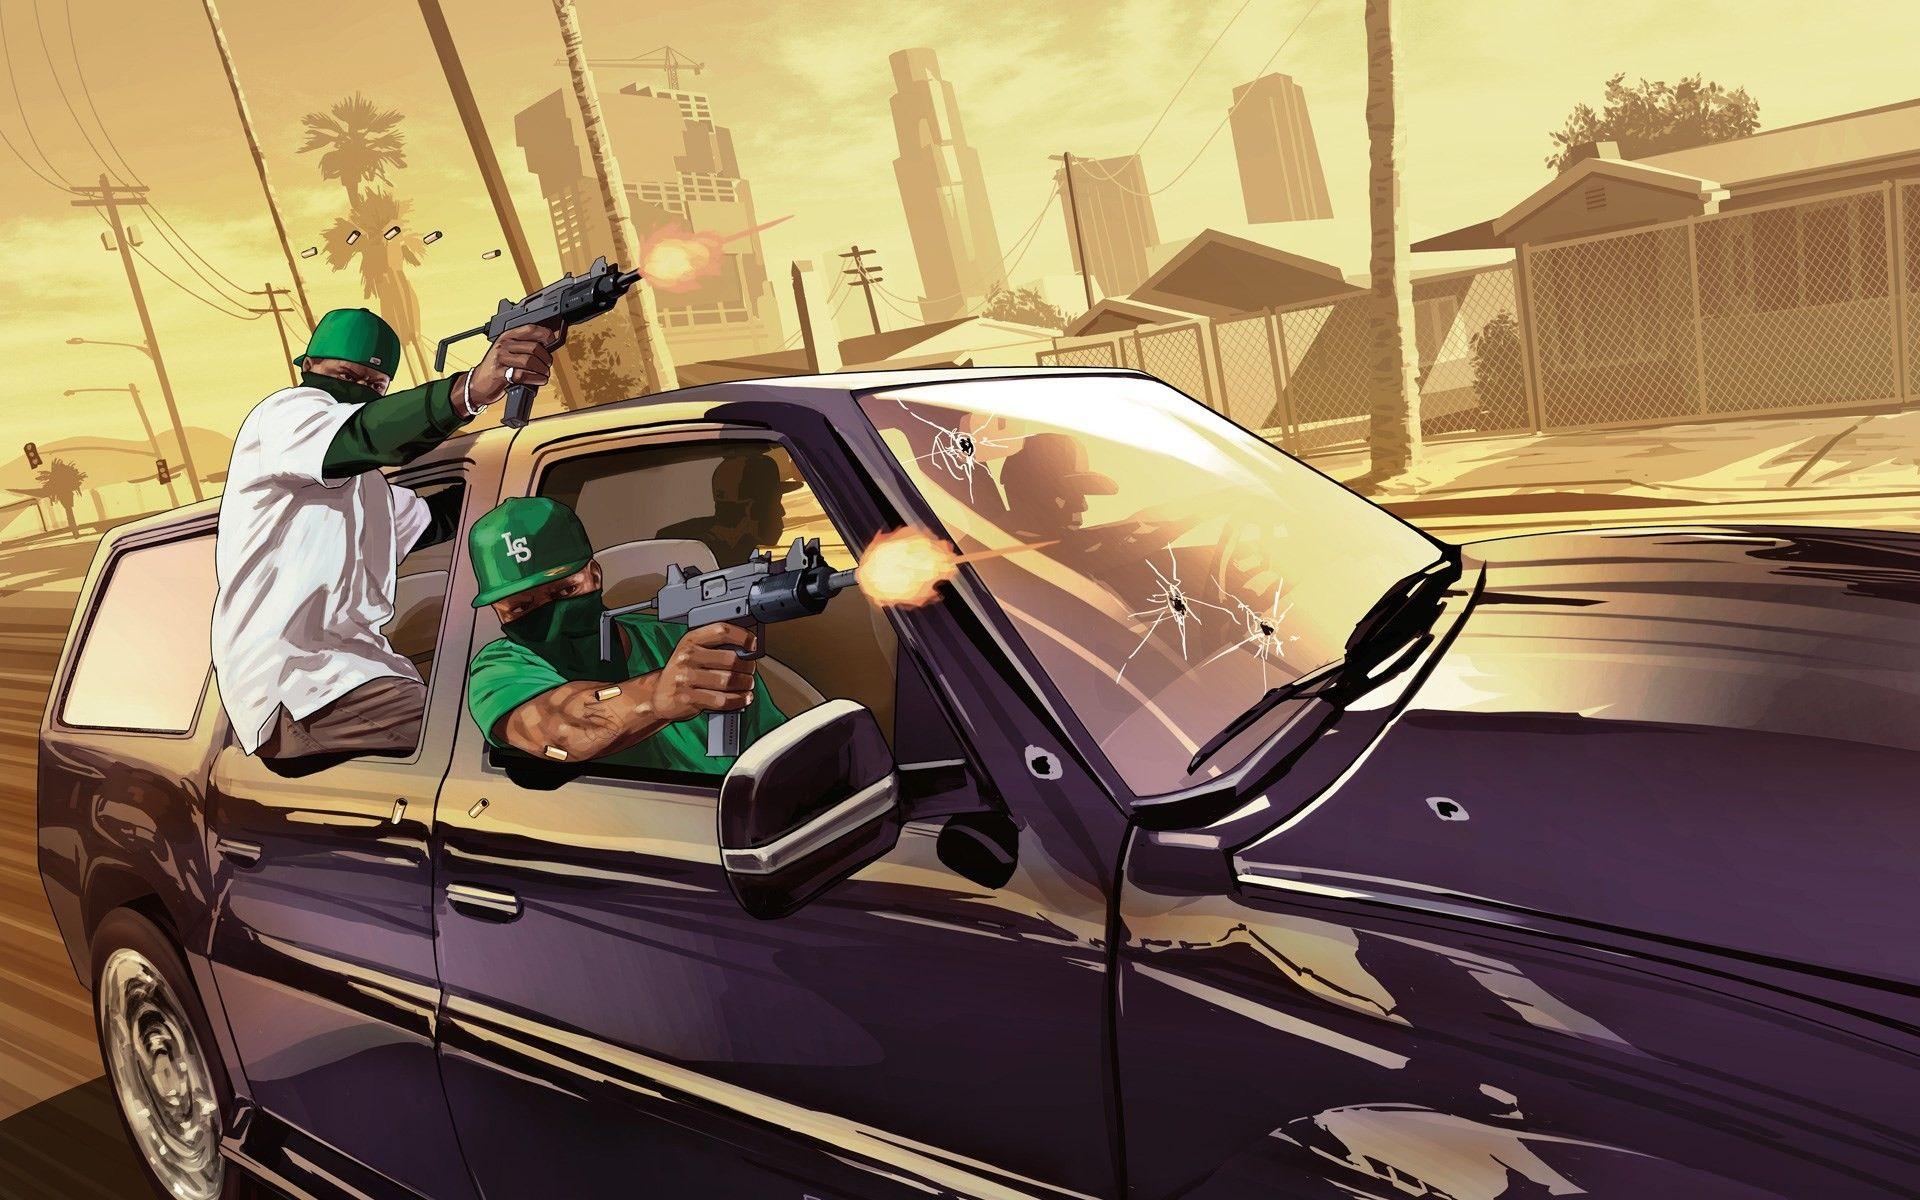 1920x1200 Grand Theft Auto V Wallpaper Backgrounds Hd 1920x1200 439 Kb Grand Theft Auto Yaris Arabasi Oyun